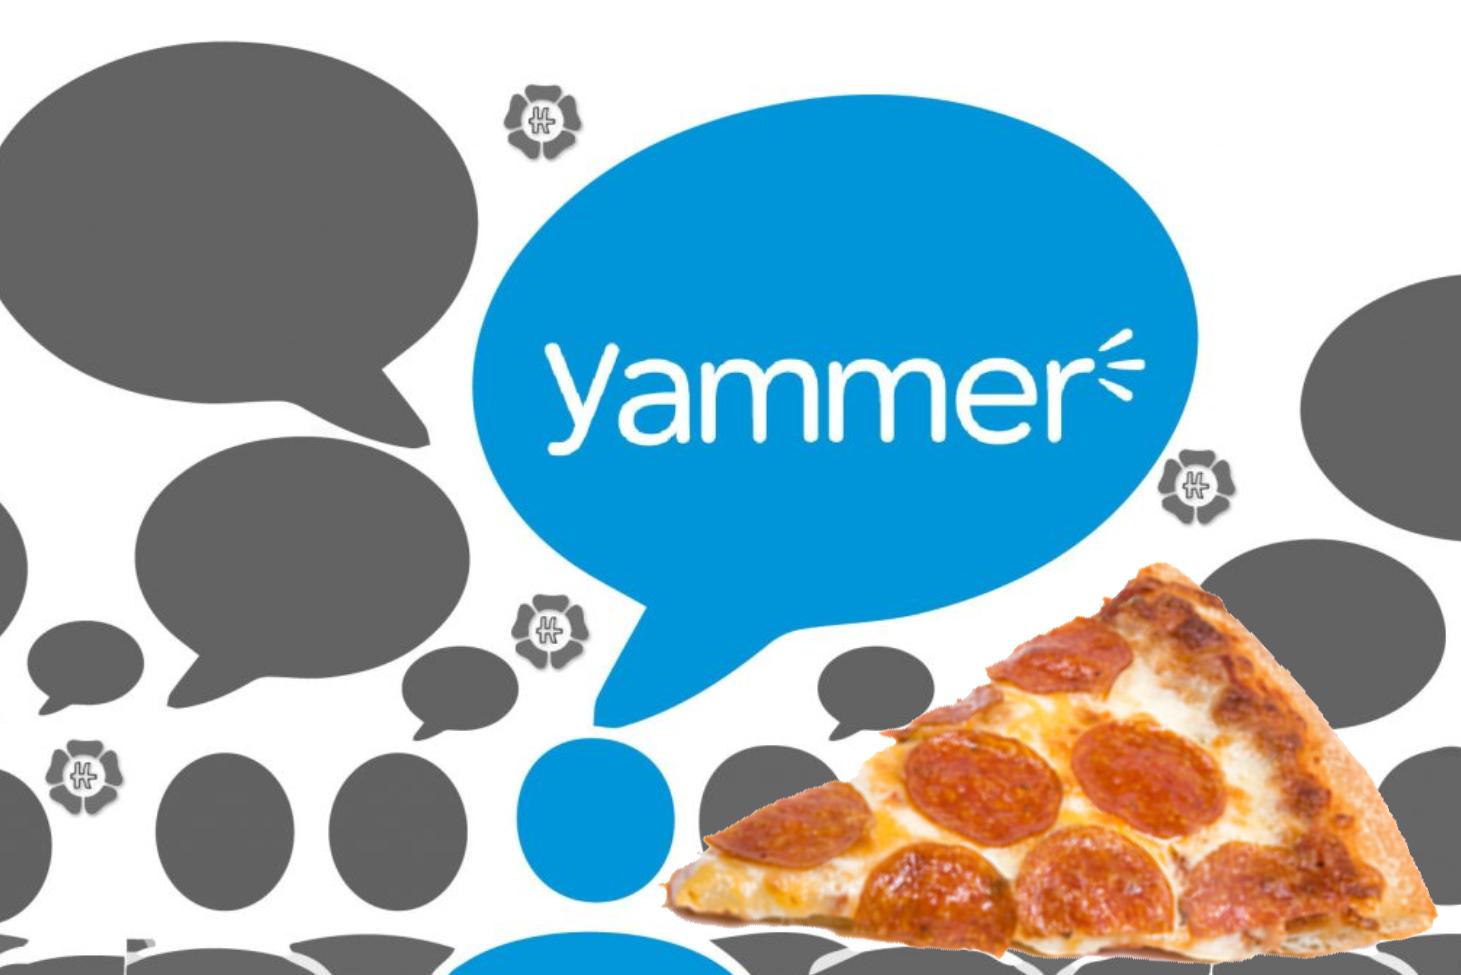 #participizza met #Yammer